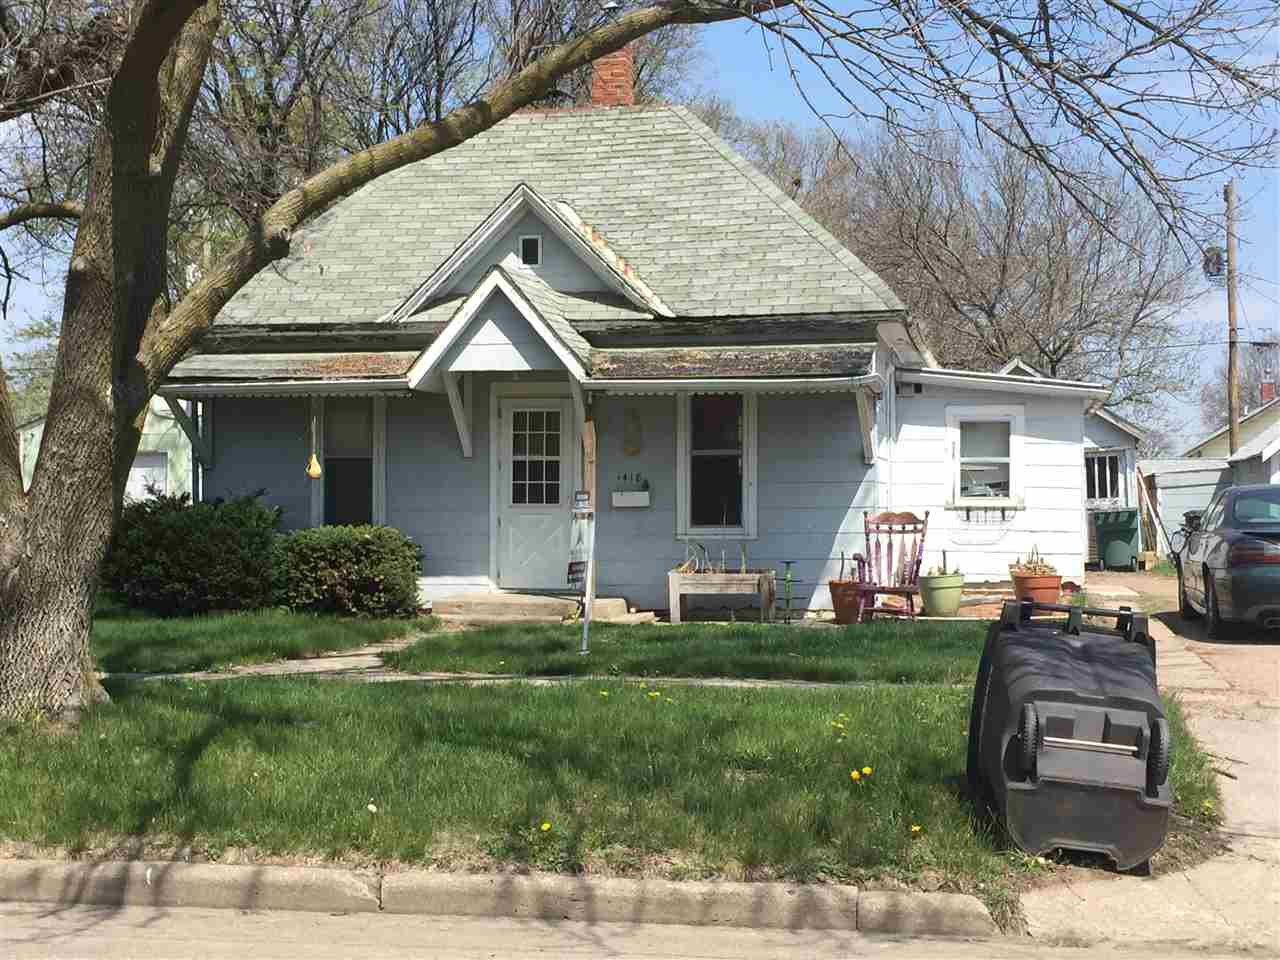 Real Estate for Sale, ListingId: 32978475, Hastings,NE68901